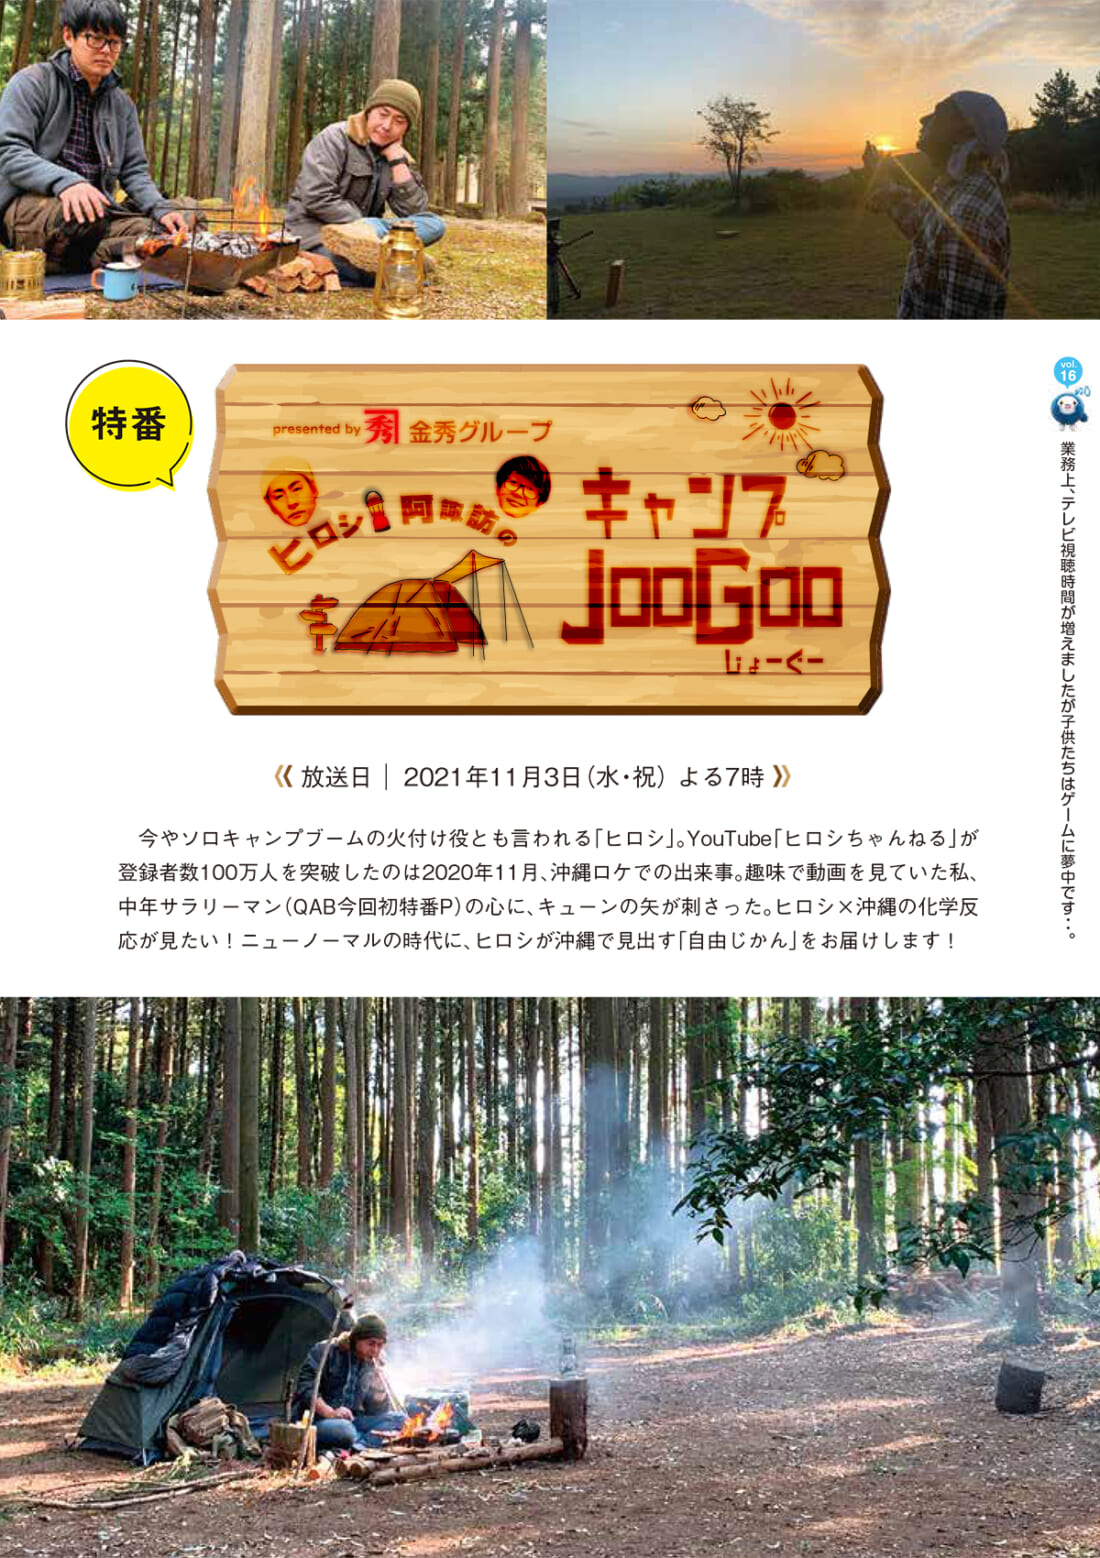 https://www.qab.co.jp/qgoro/wp-content/uploads/quun_1602-1100x1558.jpg